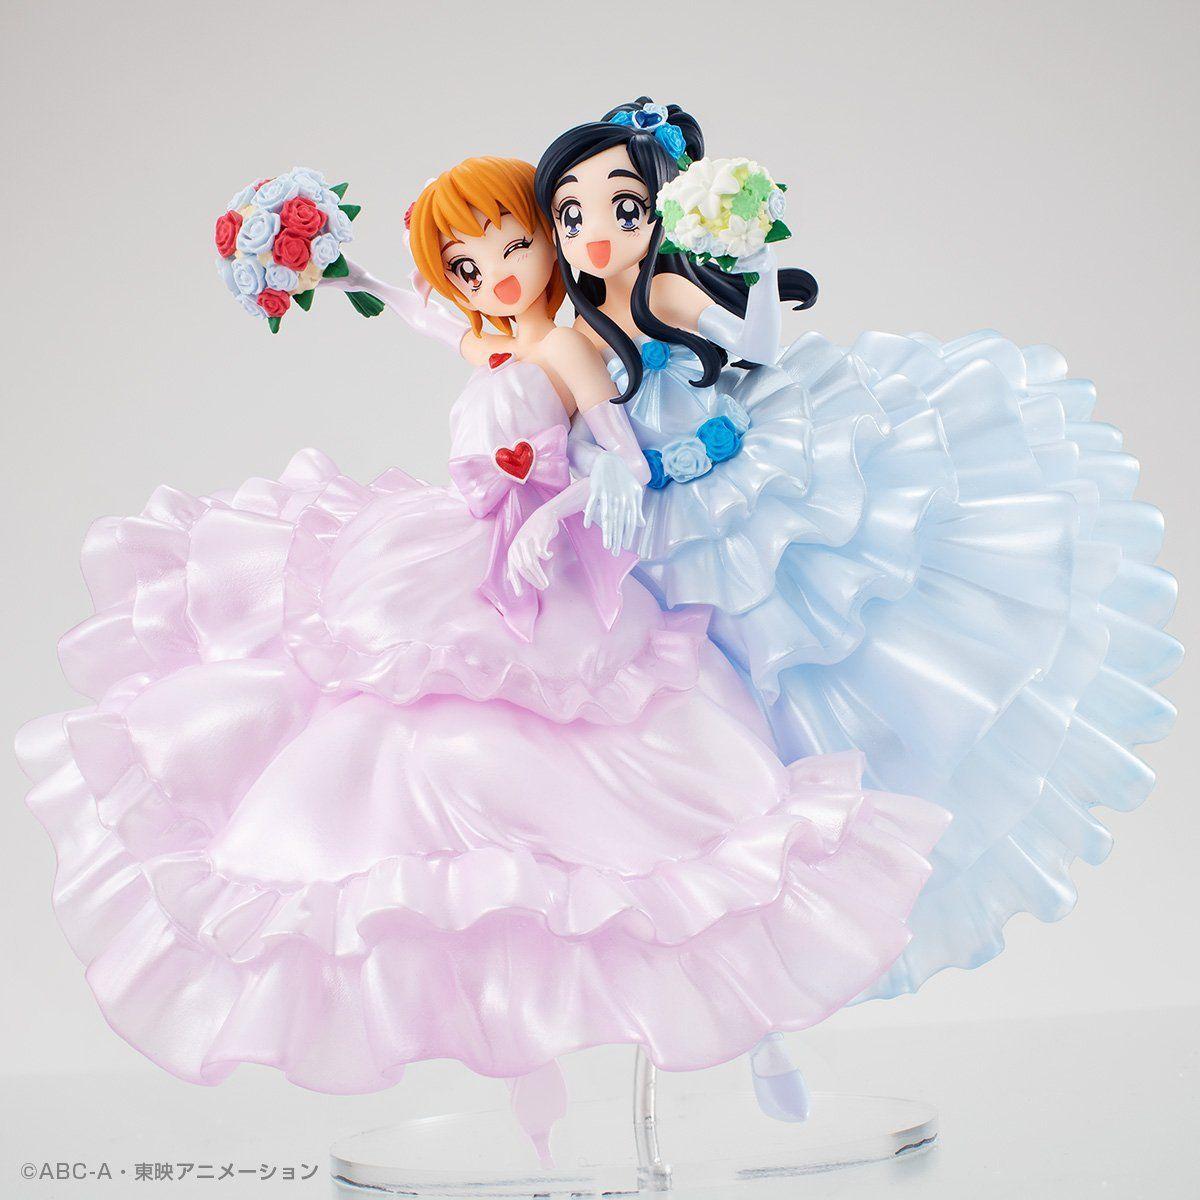 HG GIRLS『ふたりはプリキュアメモリアルフィギュア』完成品フィギュア-002